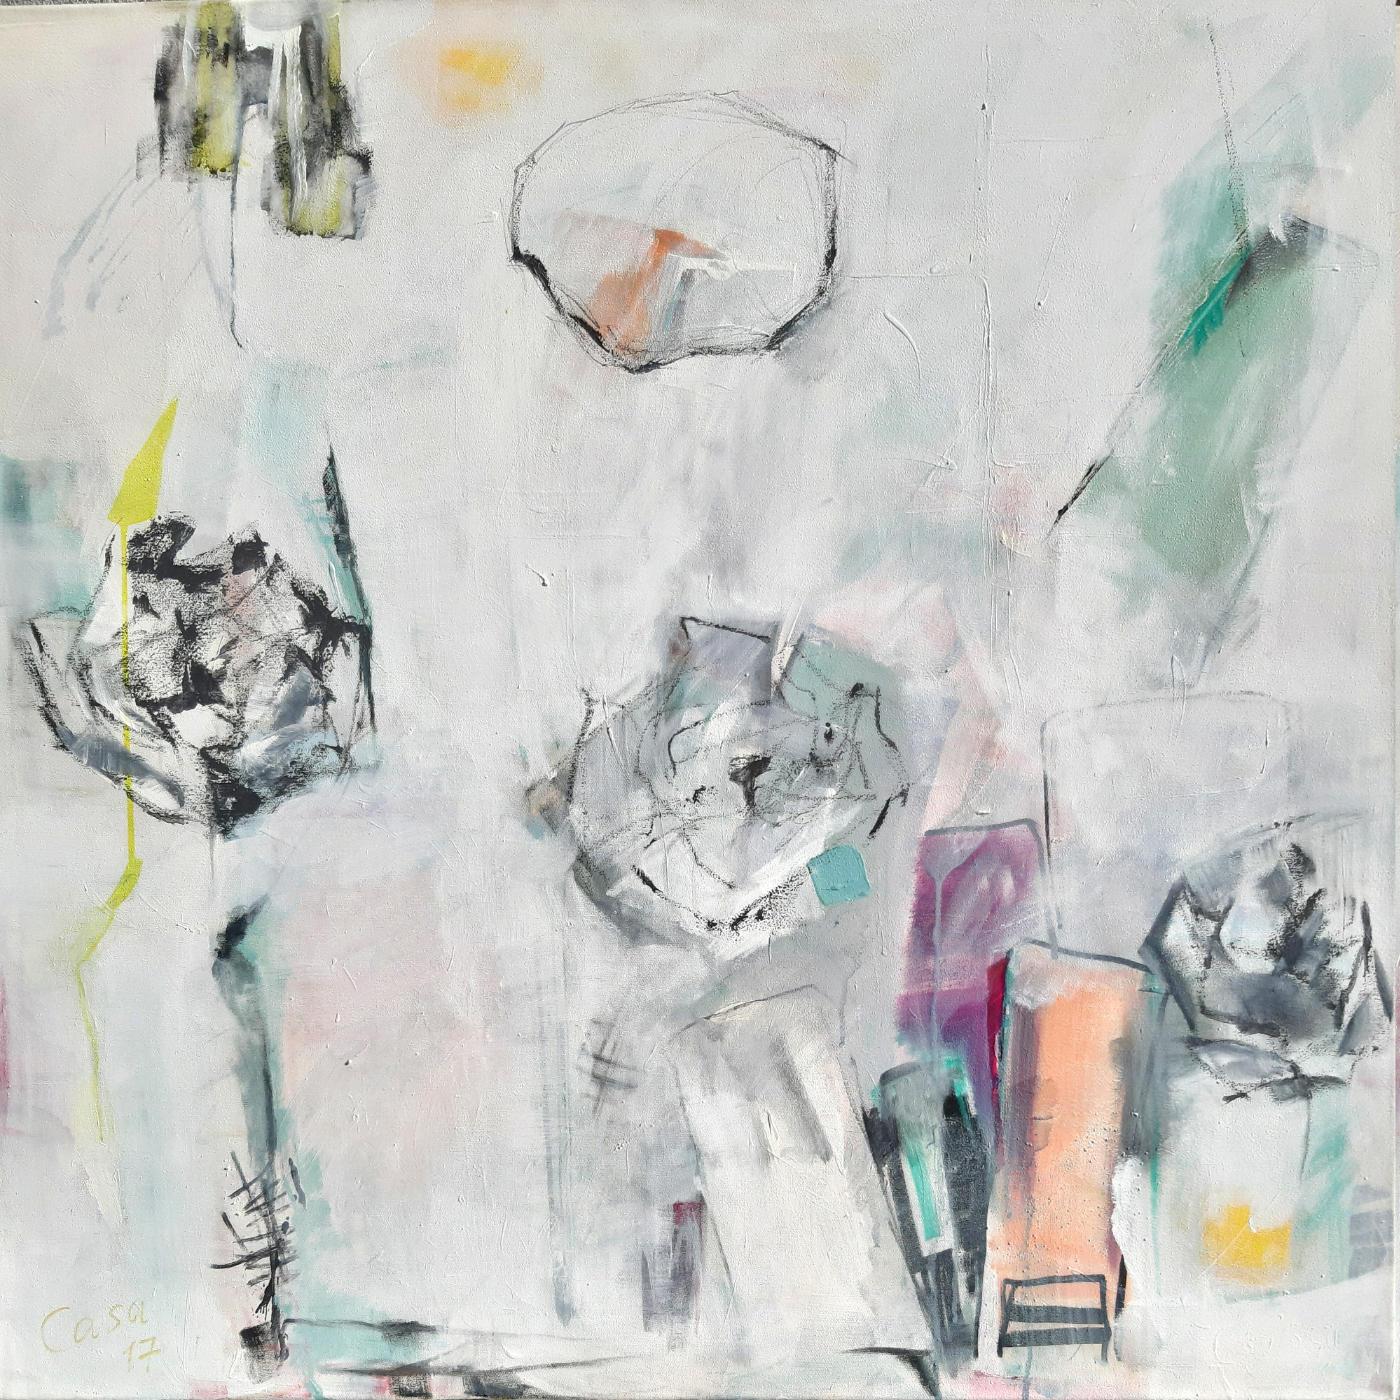 Geträumtes - Acryl, mixed media auf Leinwand, 100 x 100 cm